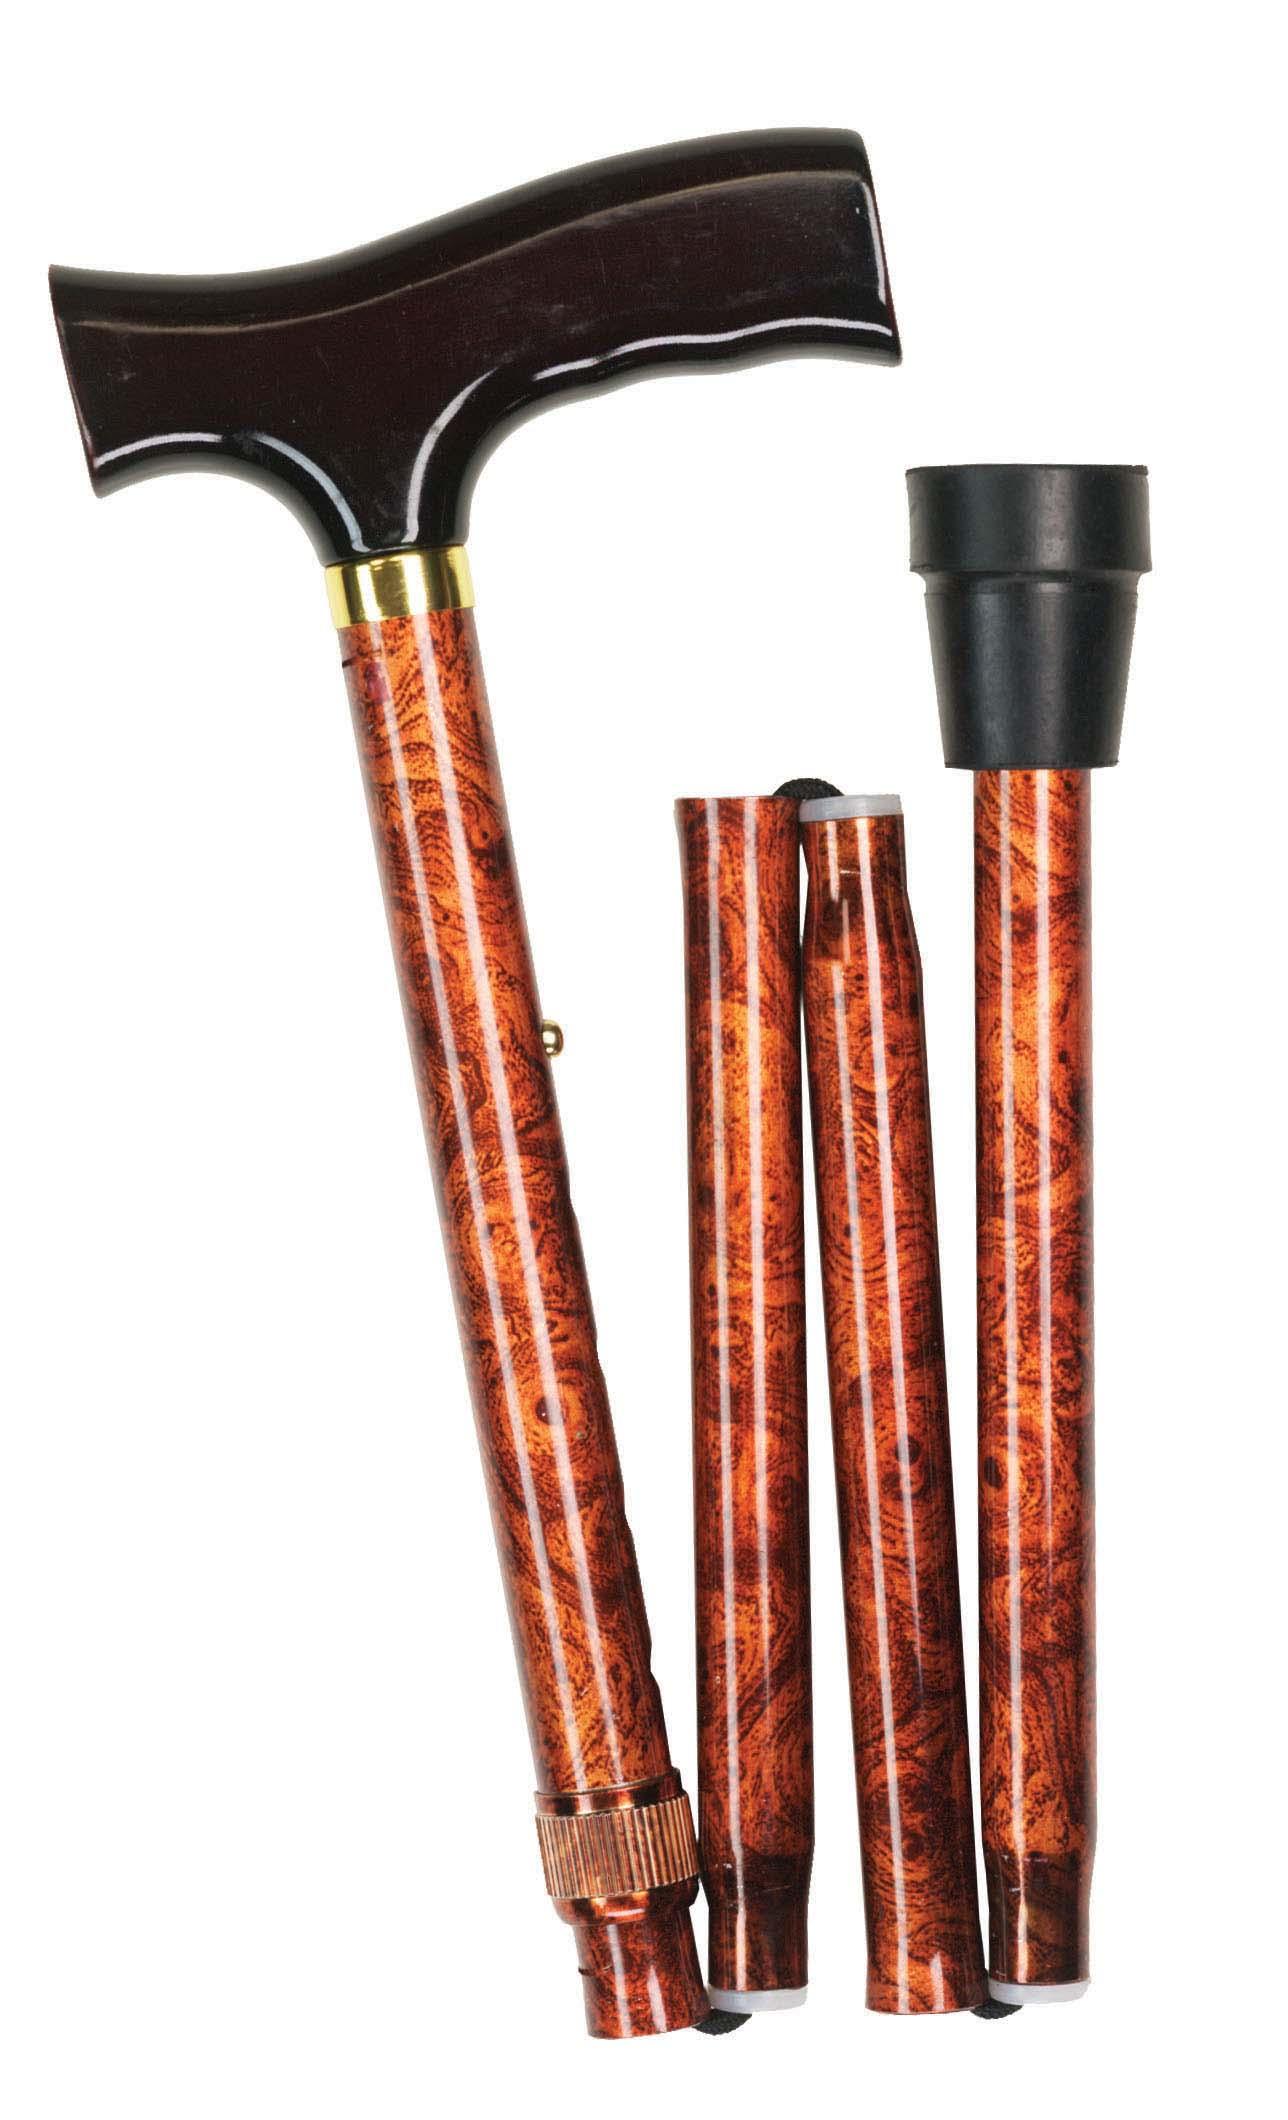 designer-folding-cane-derby-handle-copper-swirl-502-1325-9914-lr.jpg